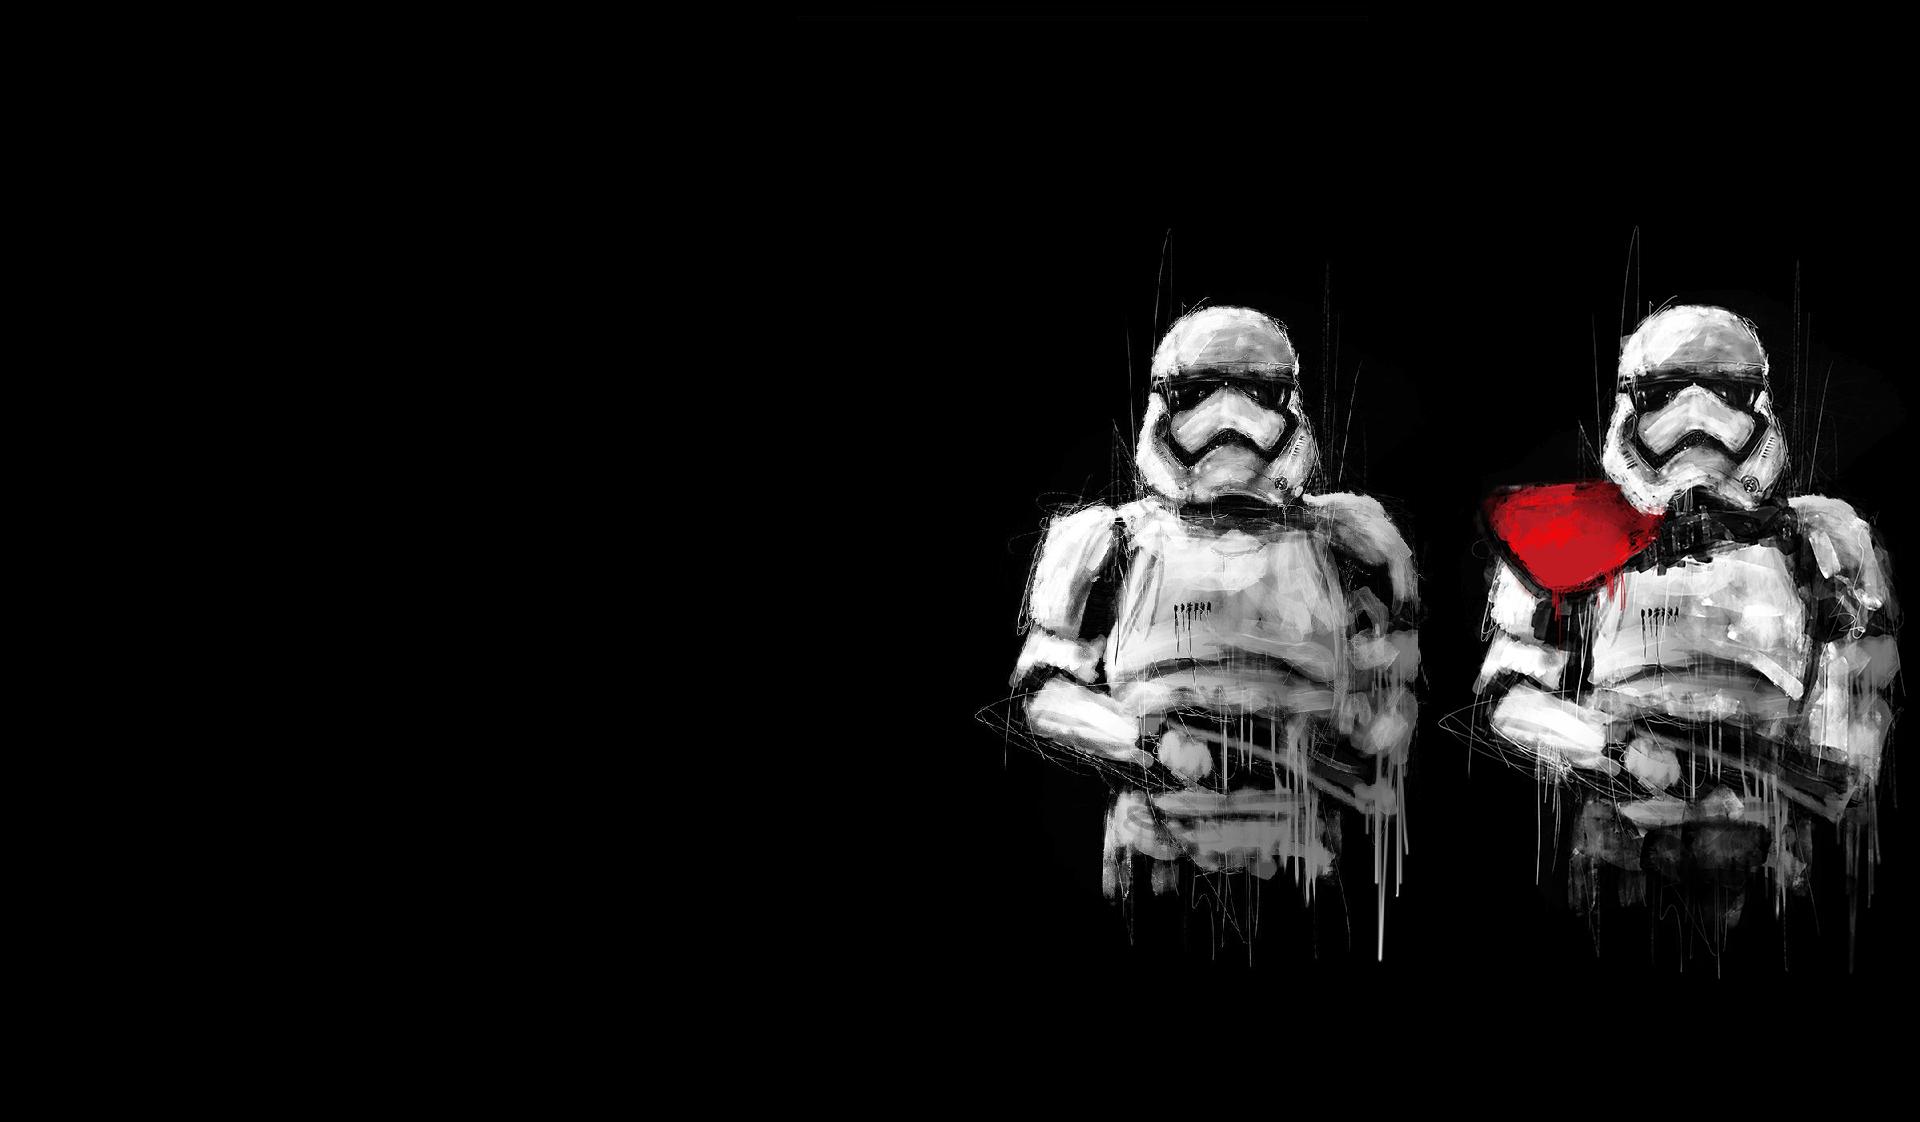 Stormtrooper Wallpapers Top Free Stormtrooper Backgrounds Wallpaperaccess